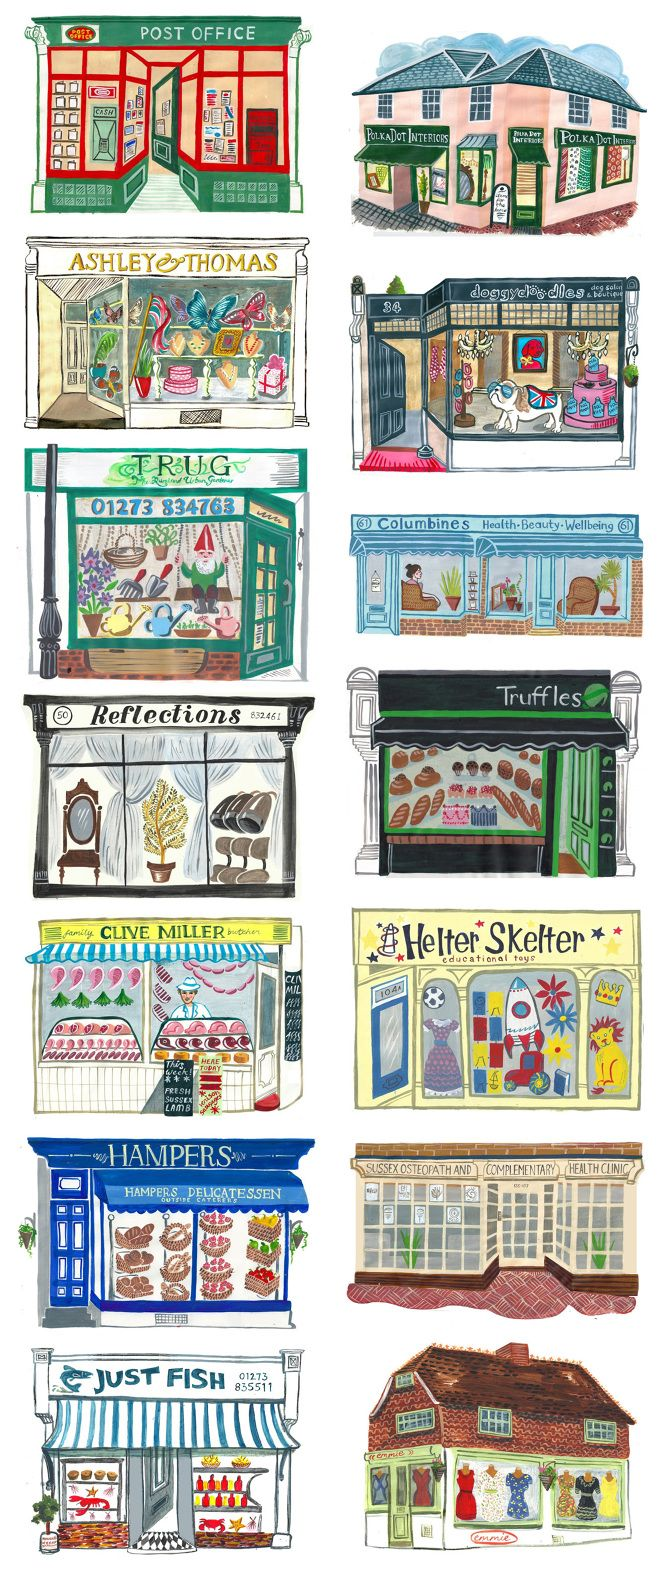 Students create a store front, perspective doors, windows, angles, design, font, decor. Hurstpierpoint - Sarah Tanat-Jones